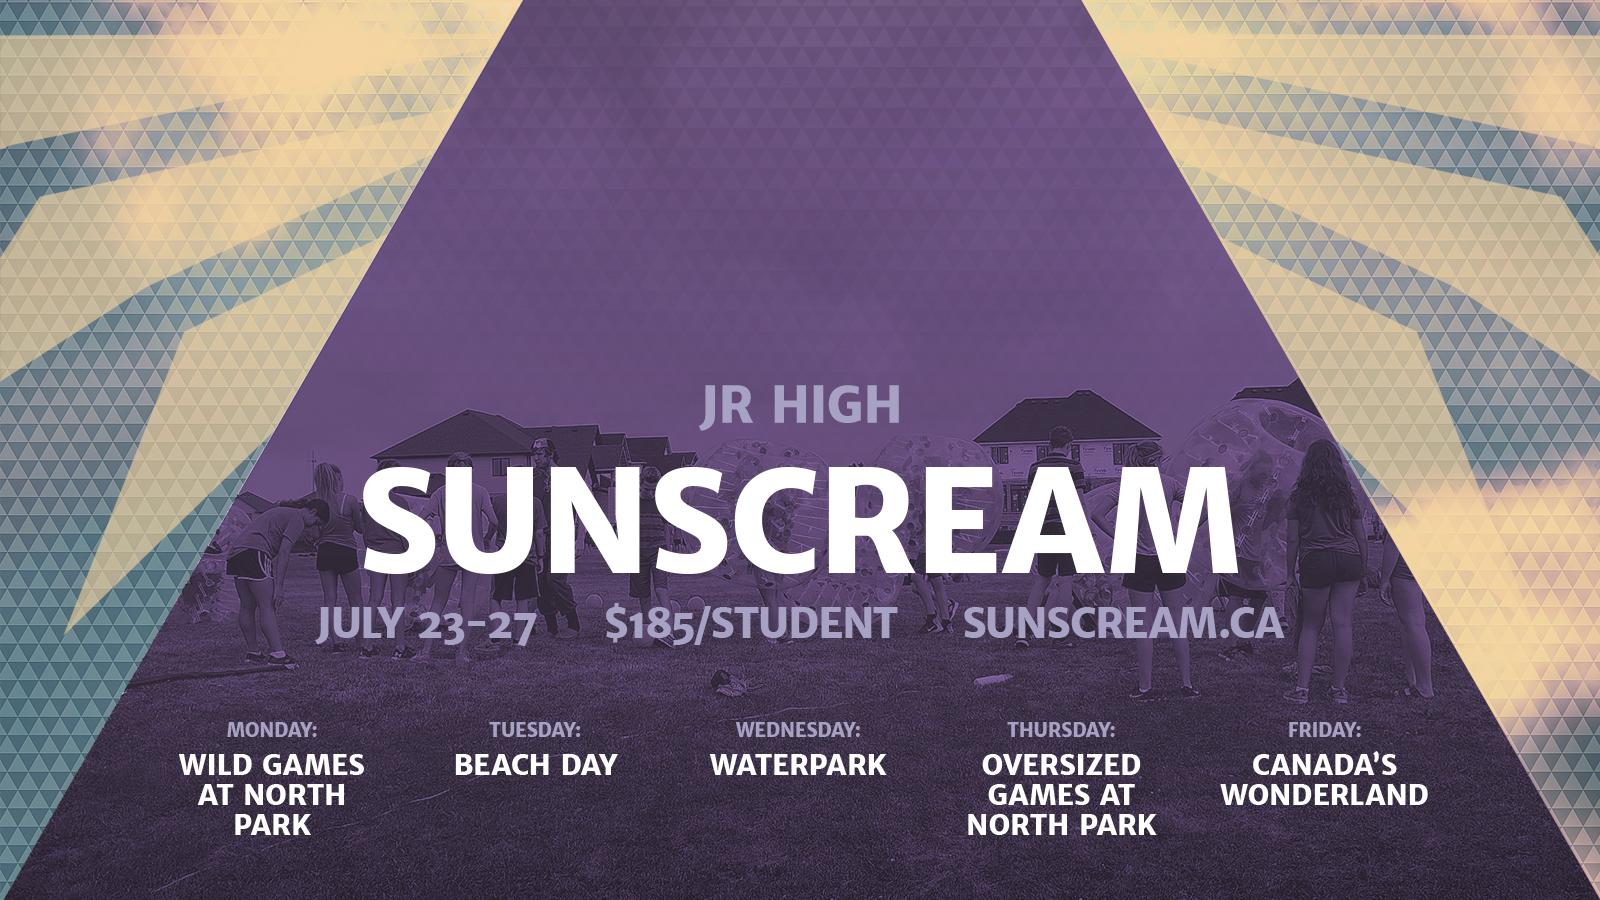 Sunscream2018 powerpoint info